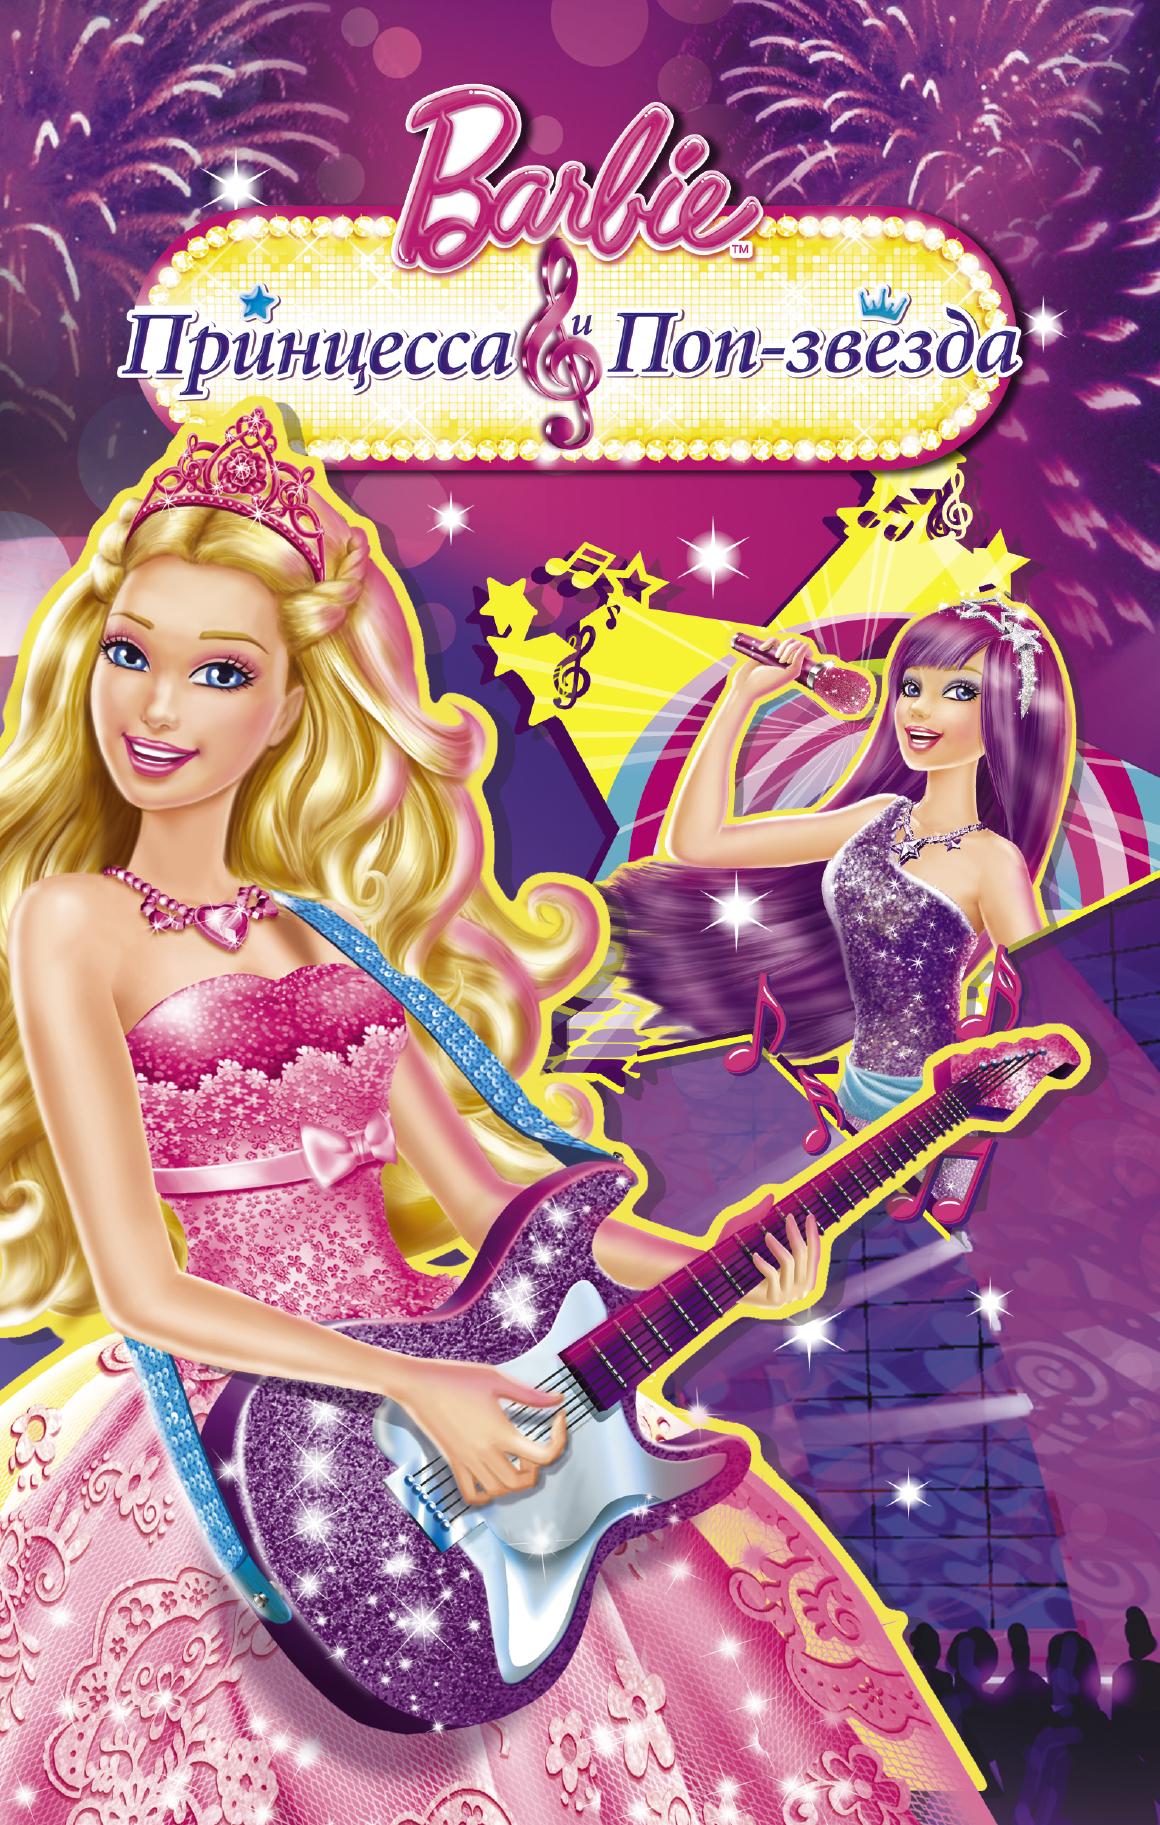 Тримбл А. Барби. Принцесса и поп-звезда тори озолс зависимая